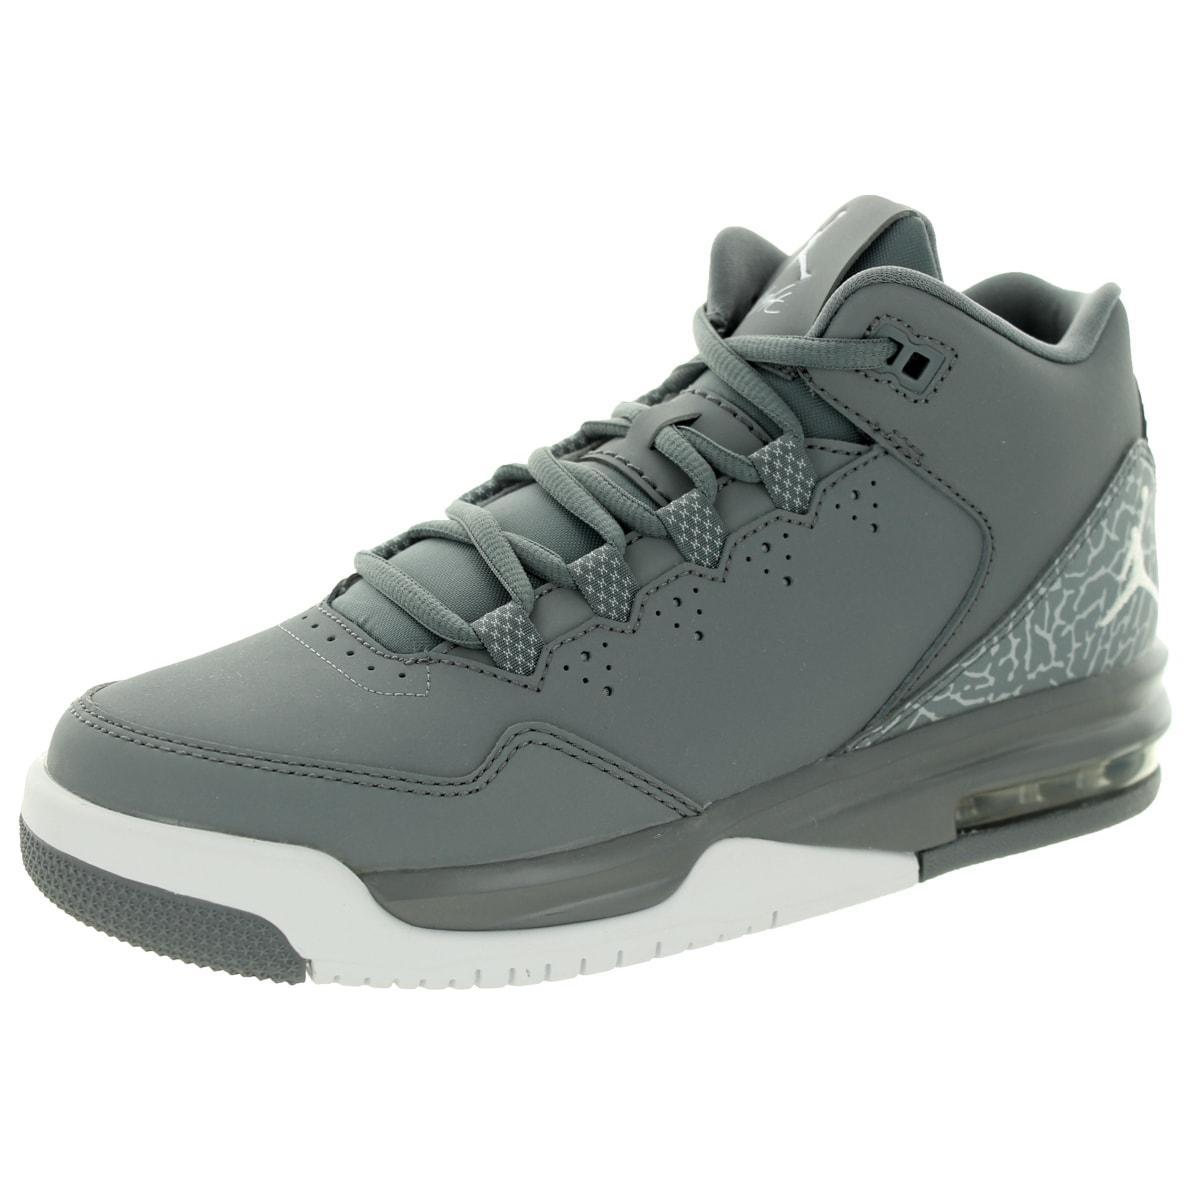 Nike Jordan Kid's Jordan Flight Origin 2 Bg Cool Grey/Whi...